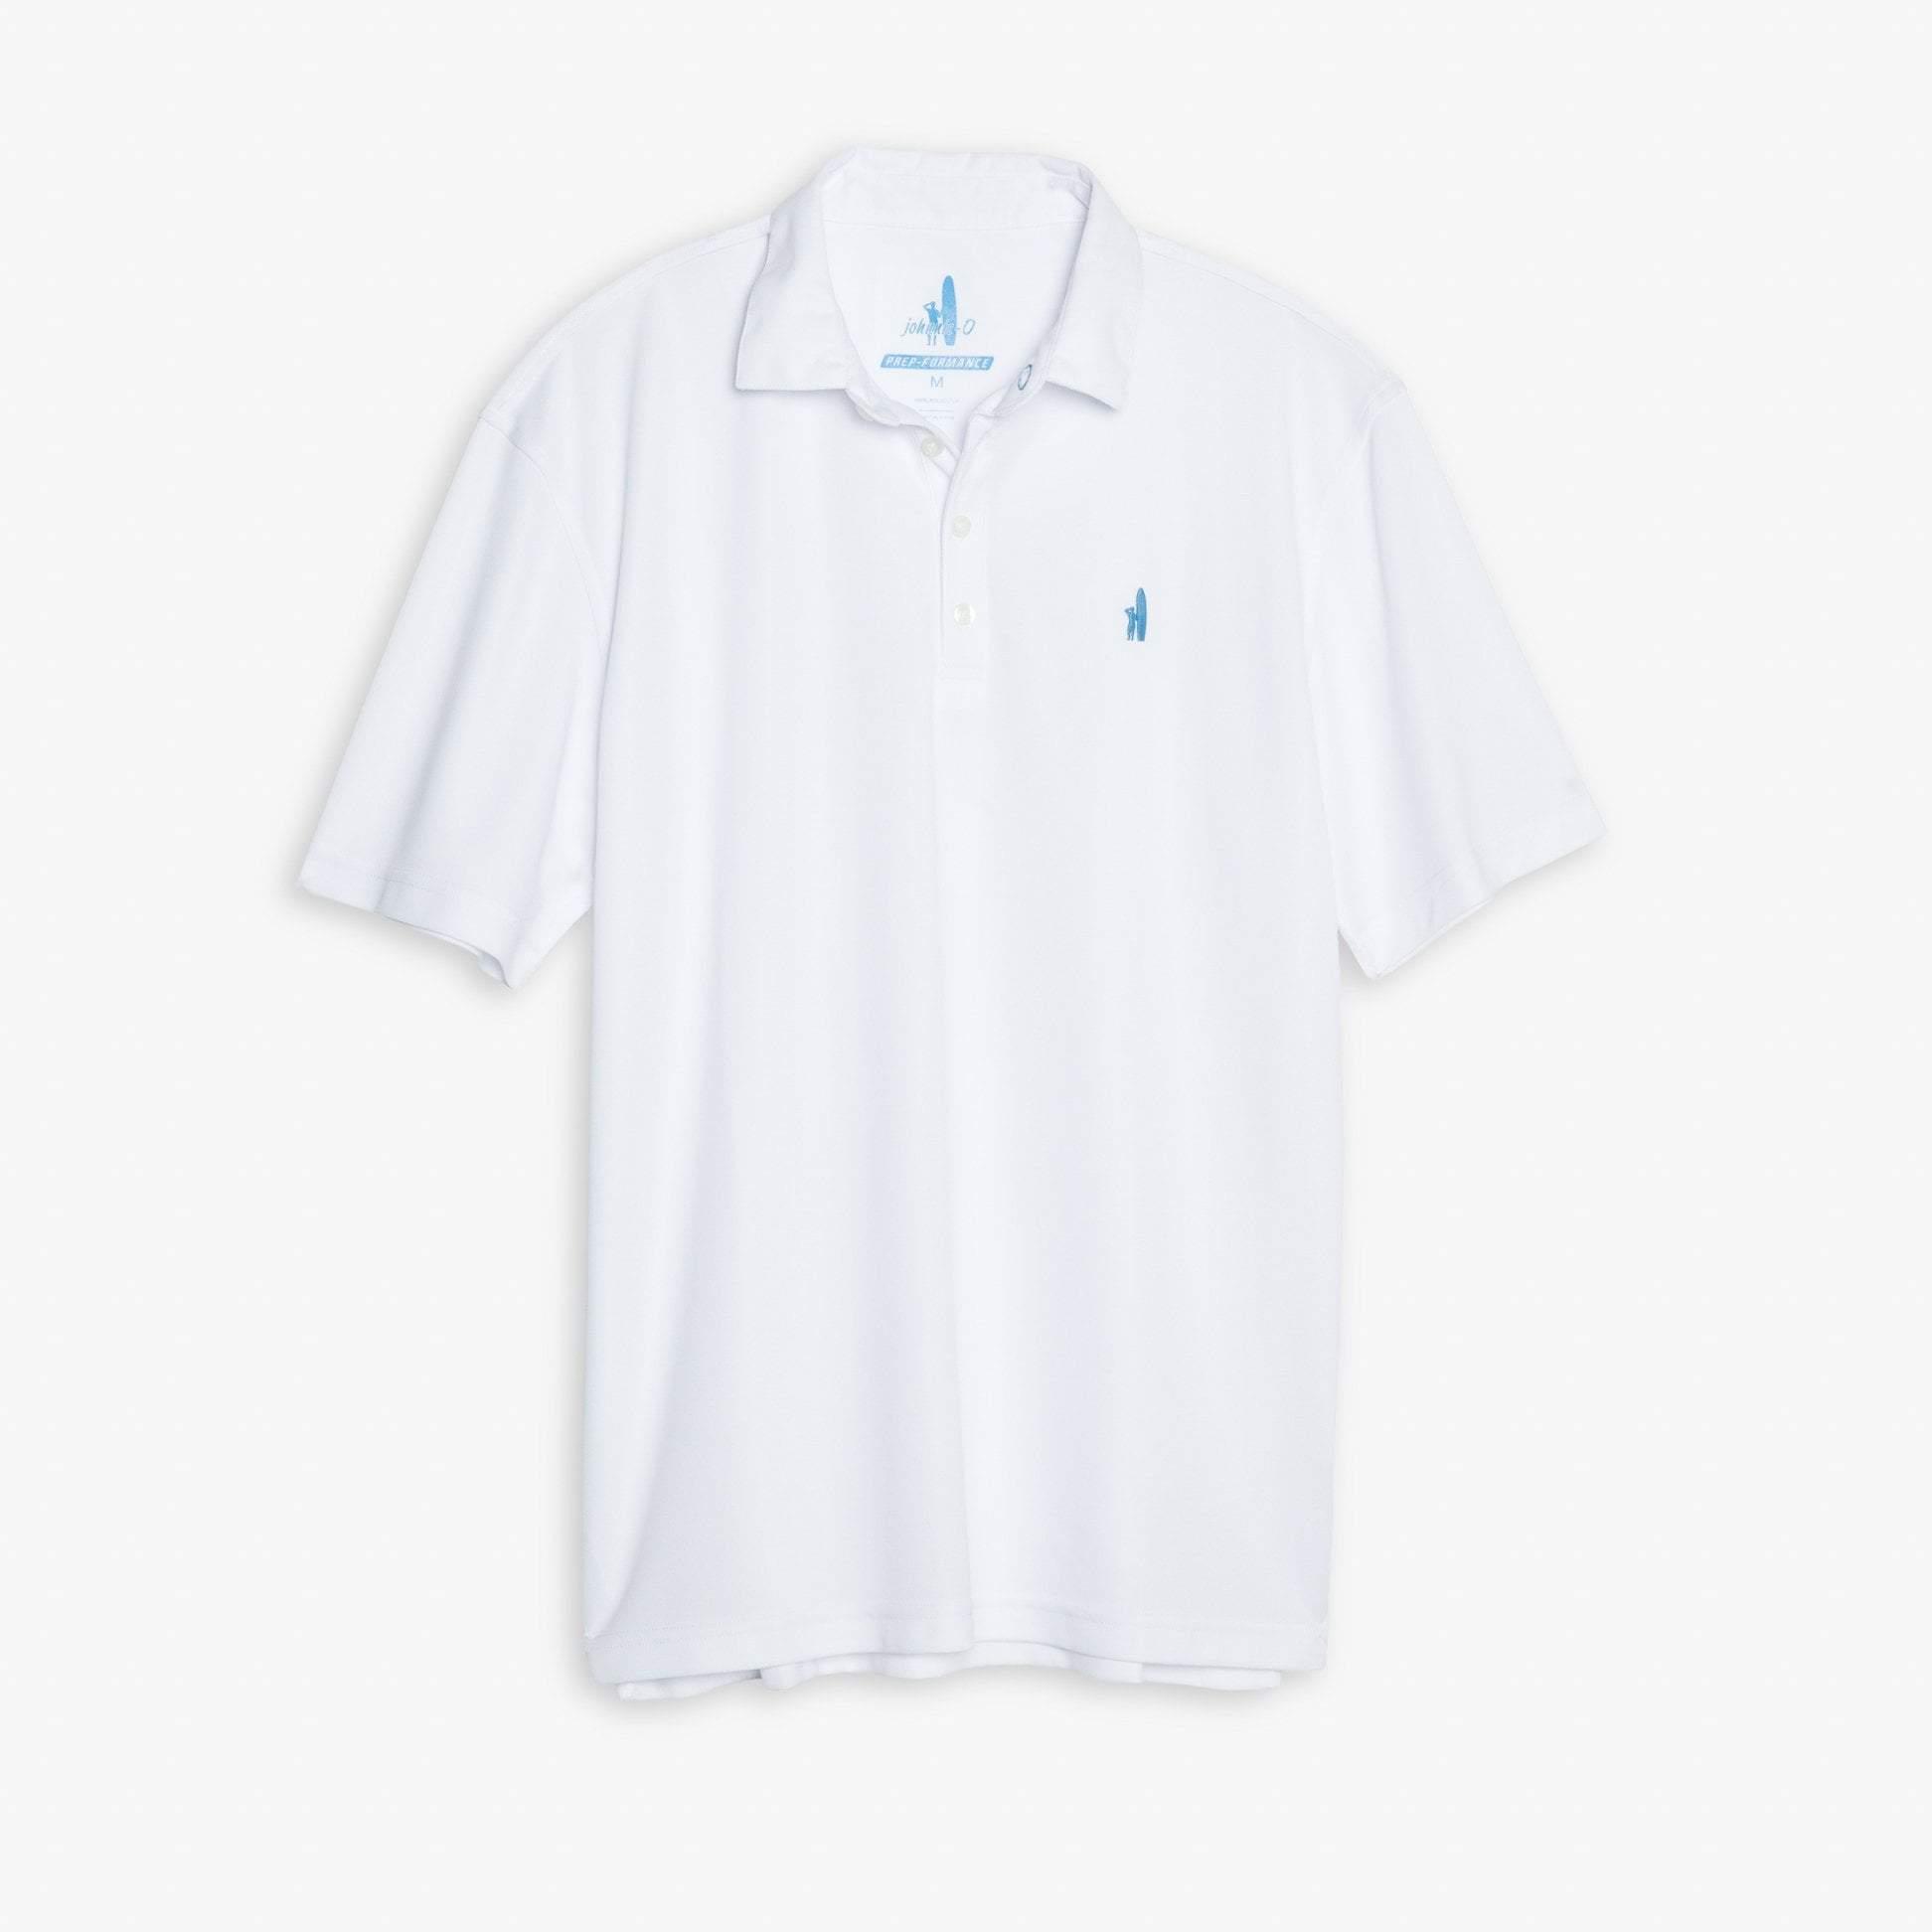 Fairway PREP-FORMANCE Pique Polo (White)